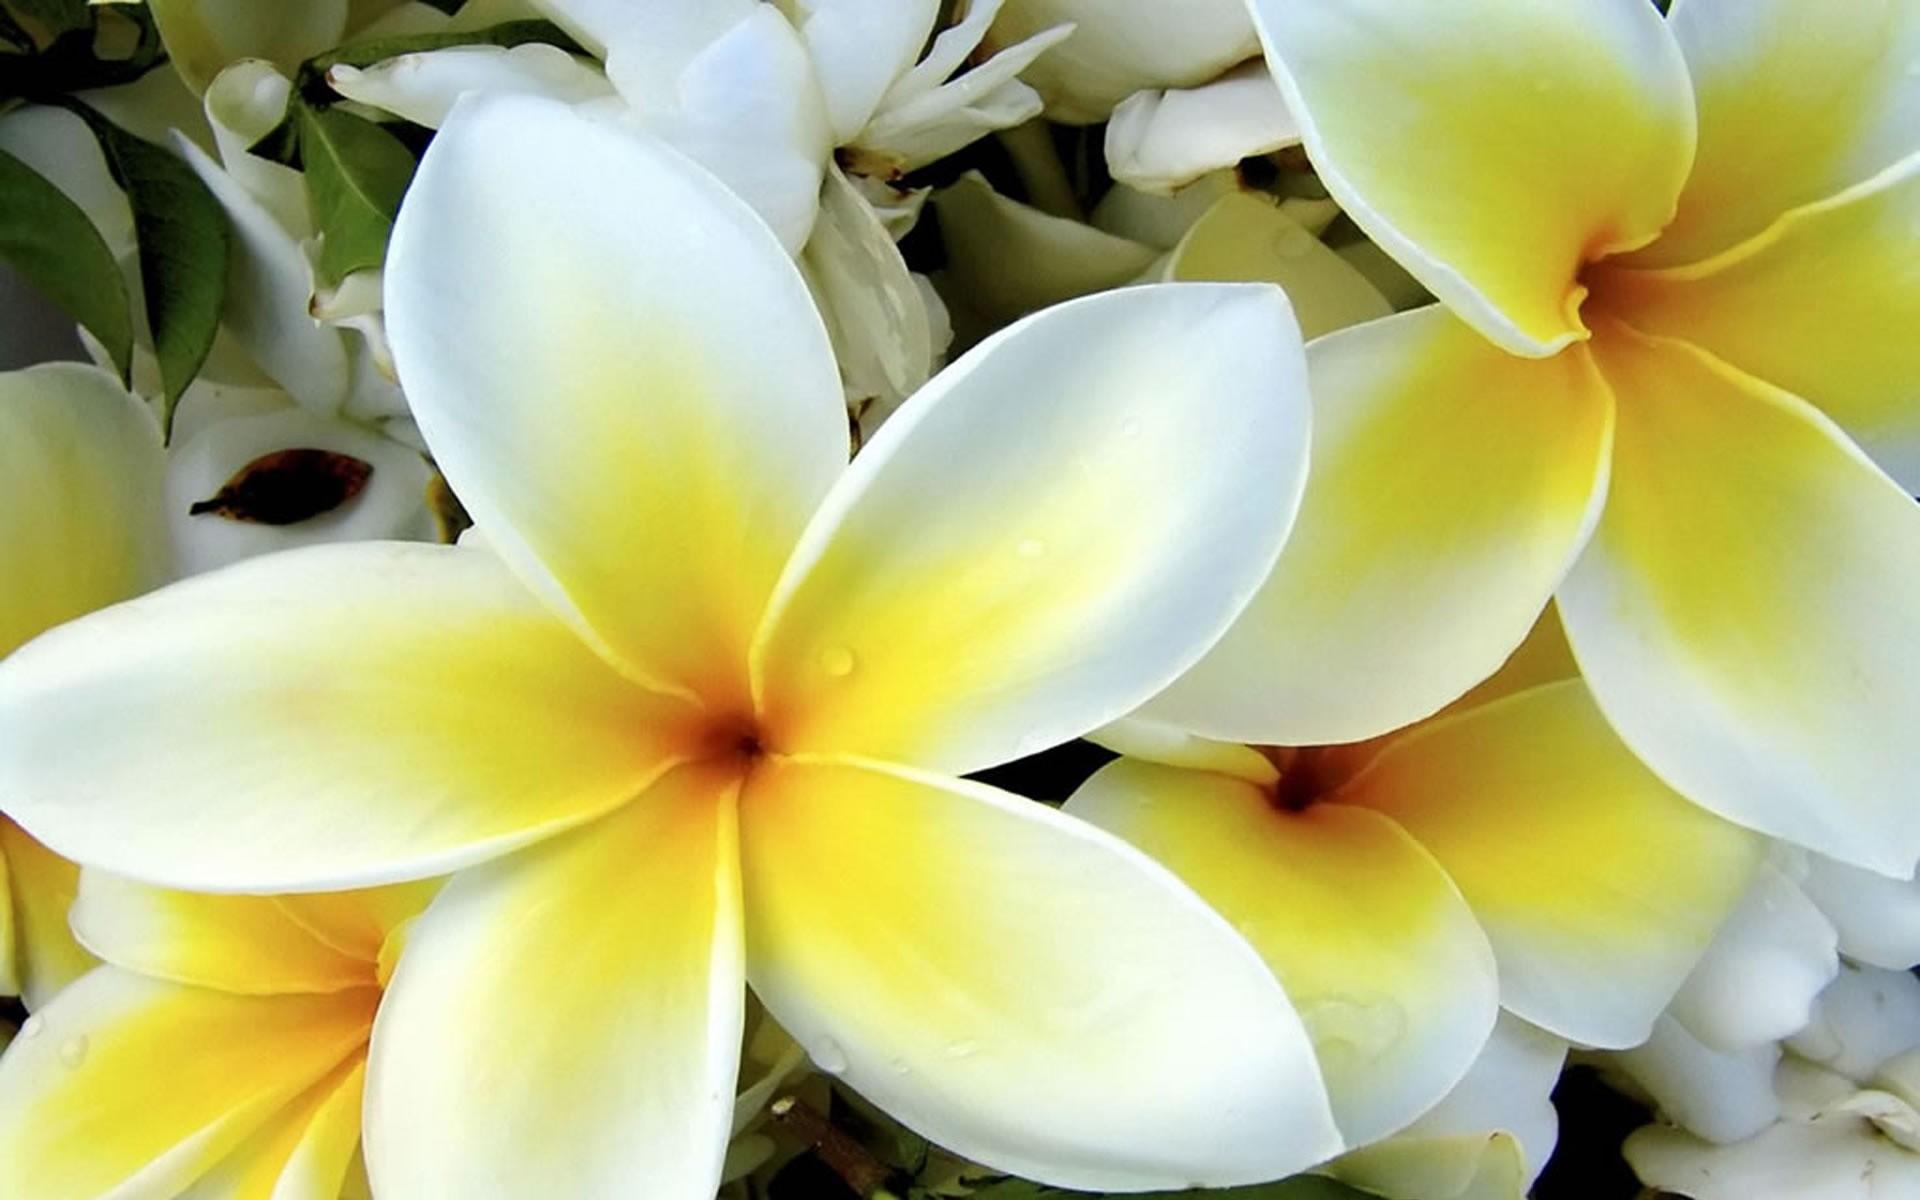 1920x1200 FUll HD 1080p Yellow Flowers Desktop Wallpapers